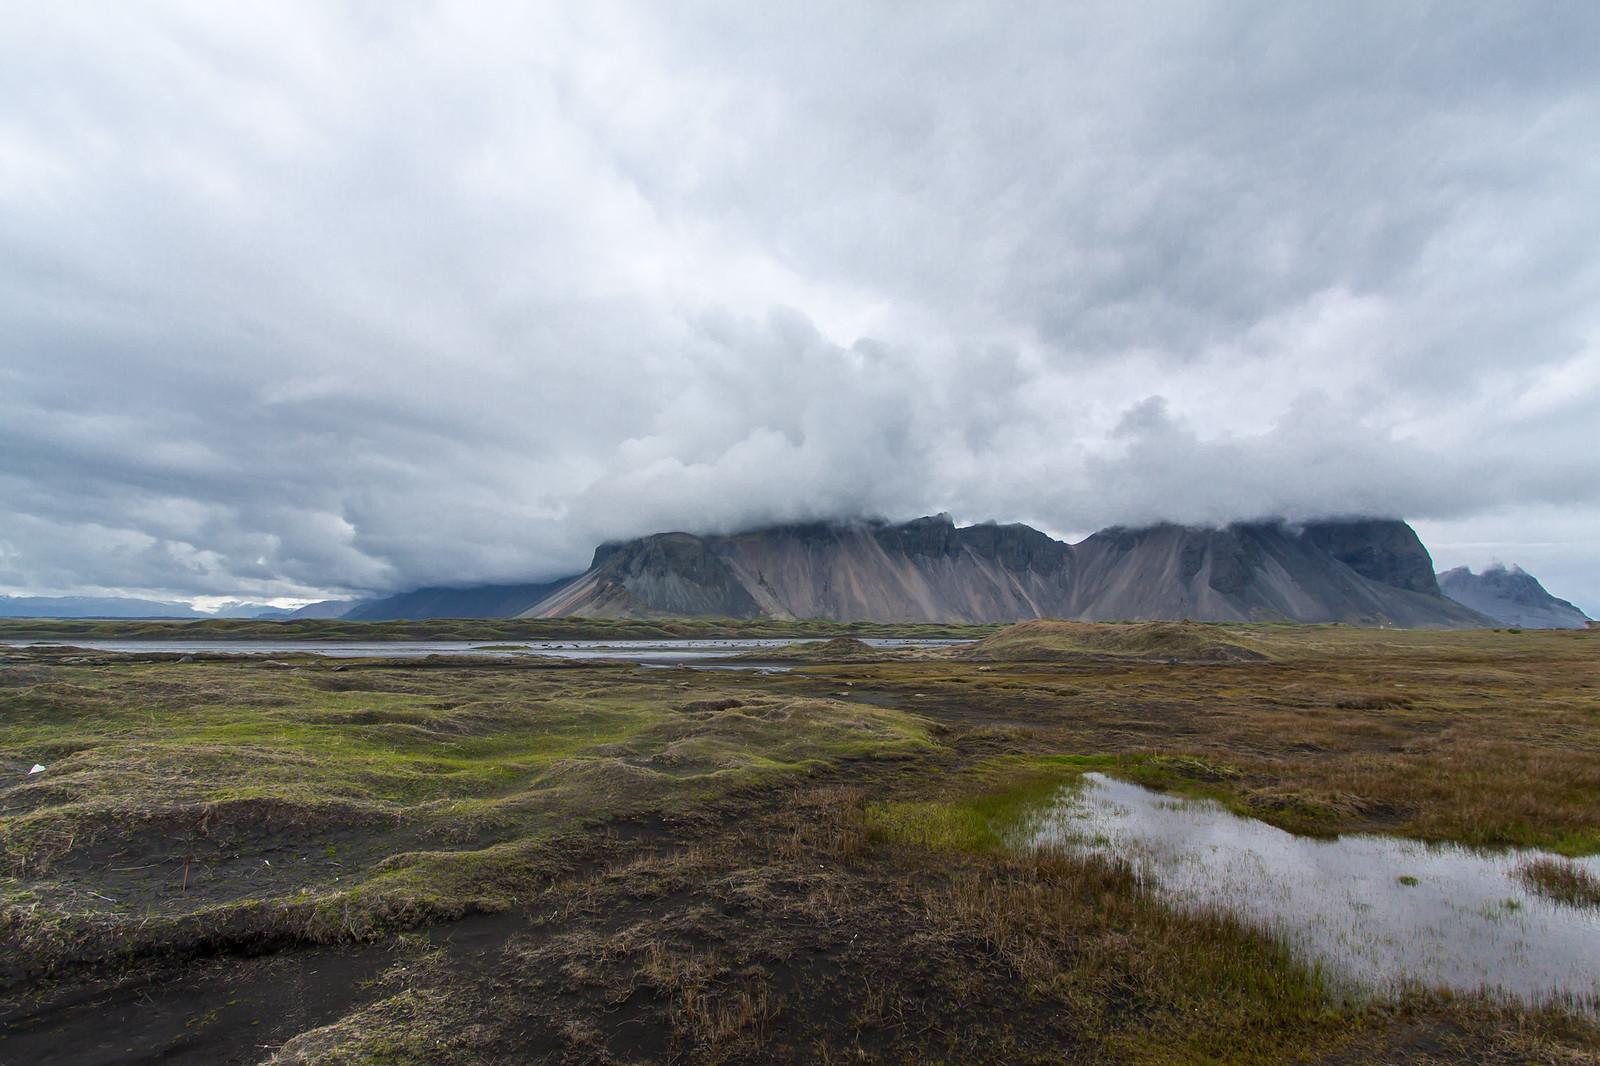 Ісландський ландшафт